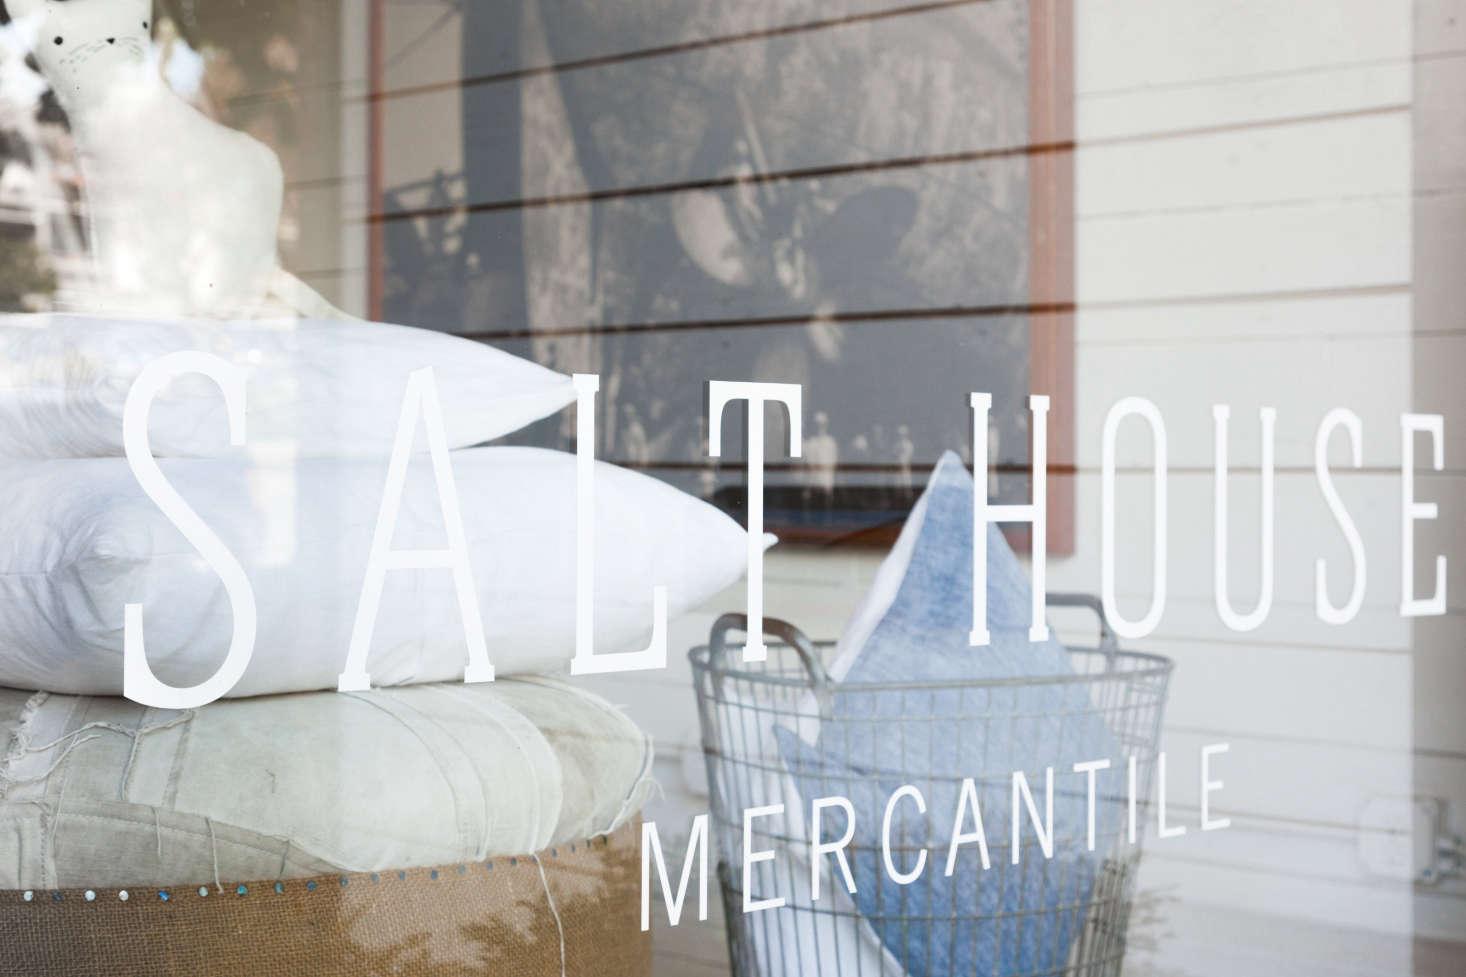 Salt House Mercantile is located at119 Winslow Way East onBainbridge Island.